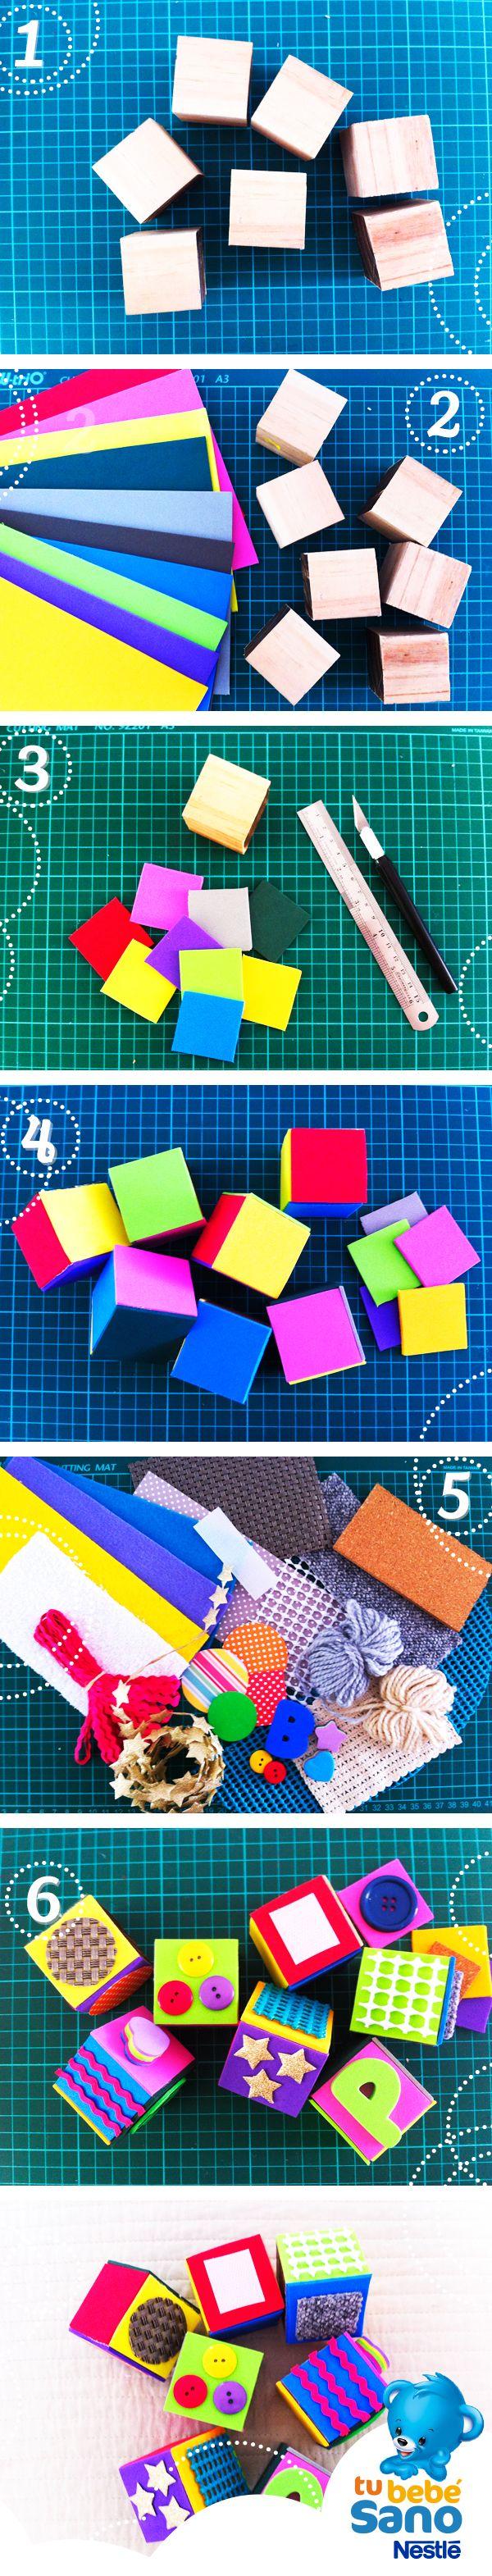 10 besten Ideas de regalos para un BB Bilder auf Pinterest ...